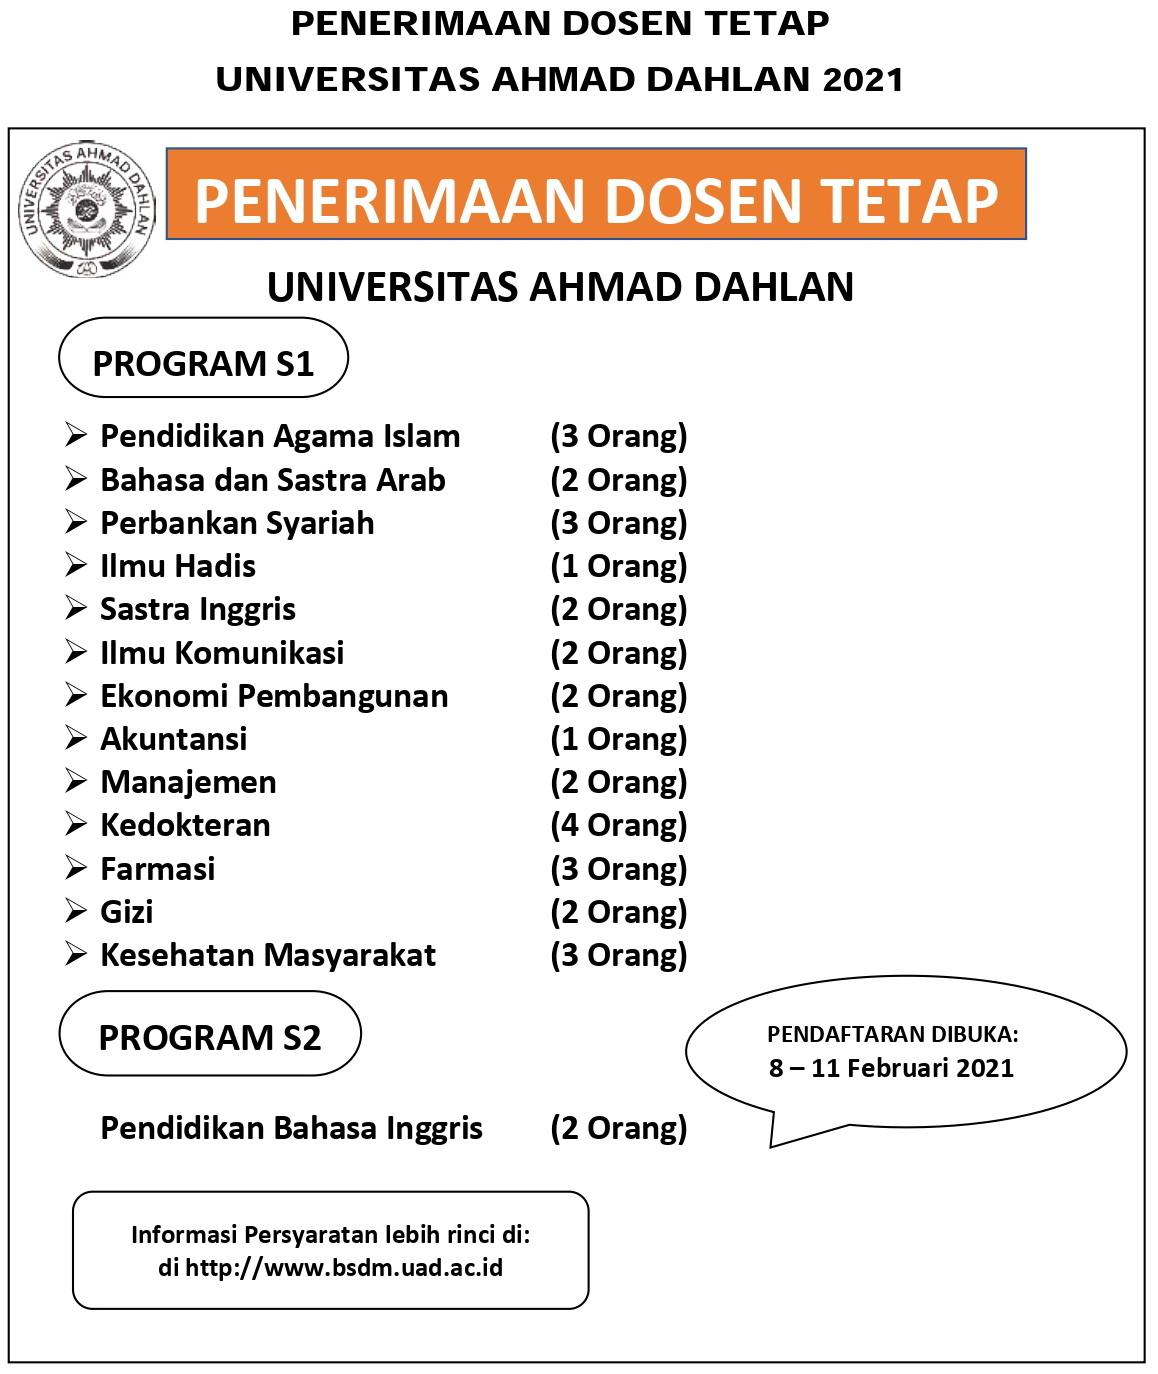 Rekrutmen Dosen, Tenaga Kependidikan dan Temporary Staff Universitas Ahmad Dahlan Tahun 2021